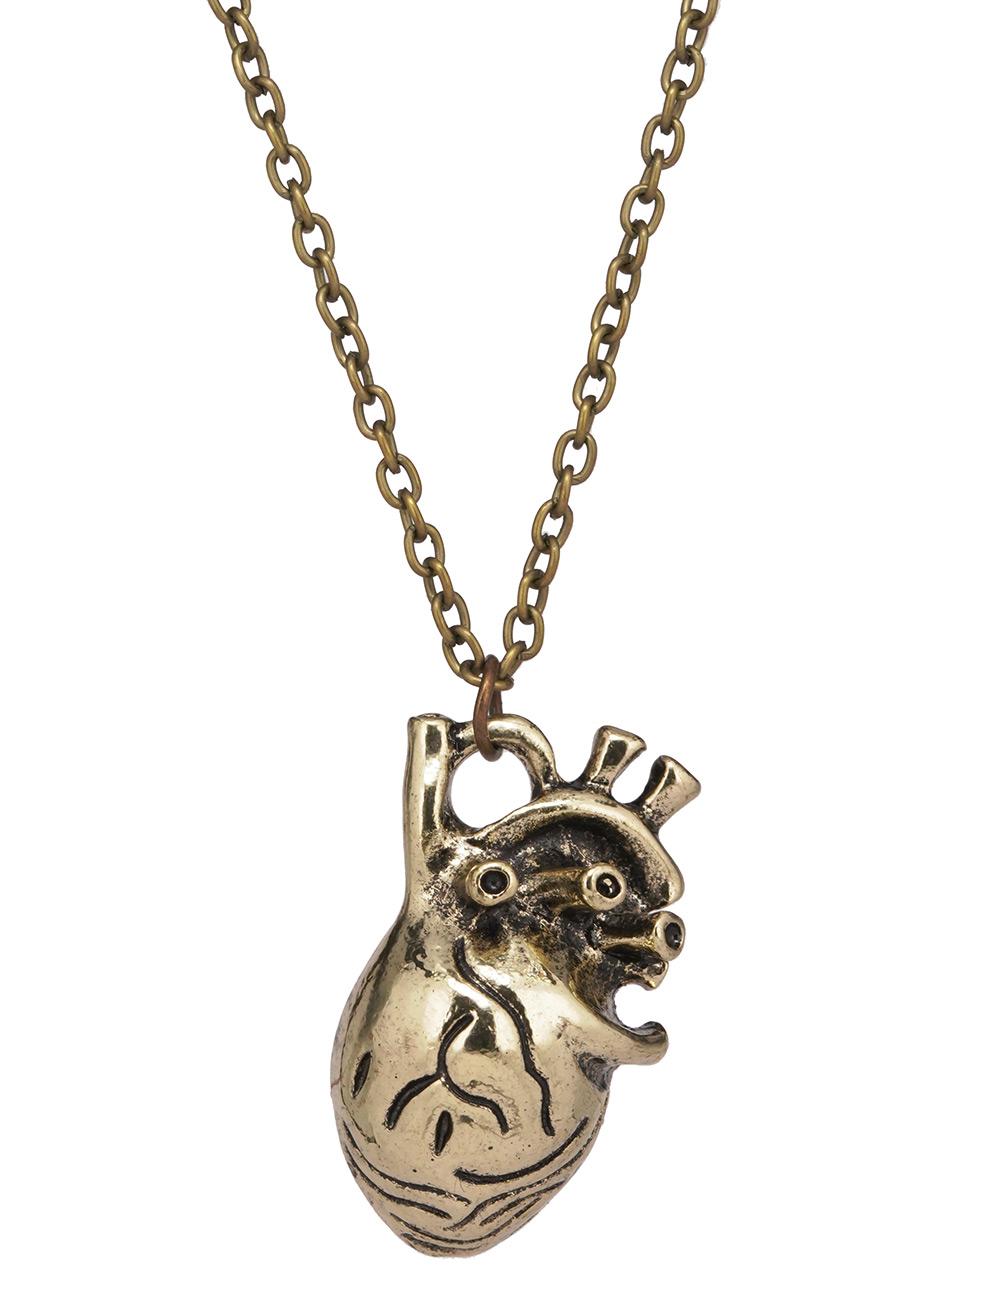 Coeur Steampunk collier pendentif coeur steampunk couleur dorée > japan attitude